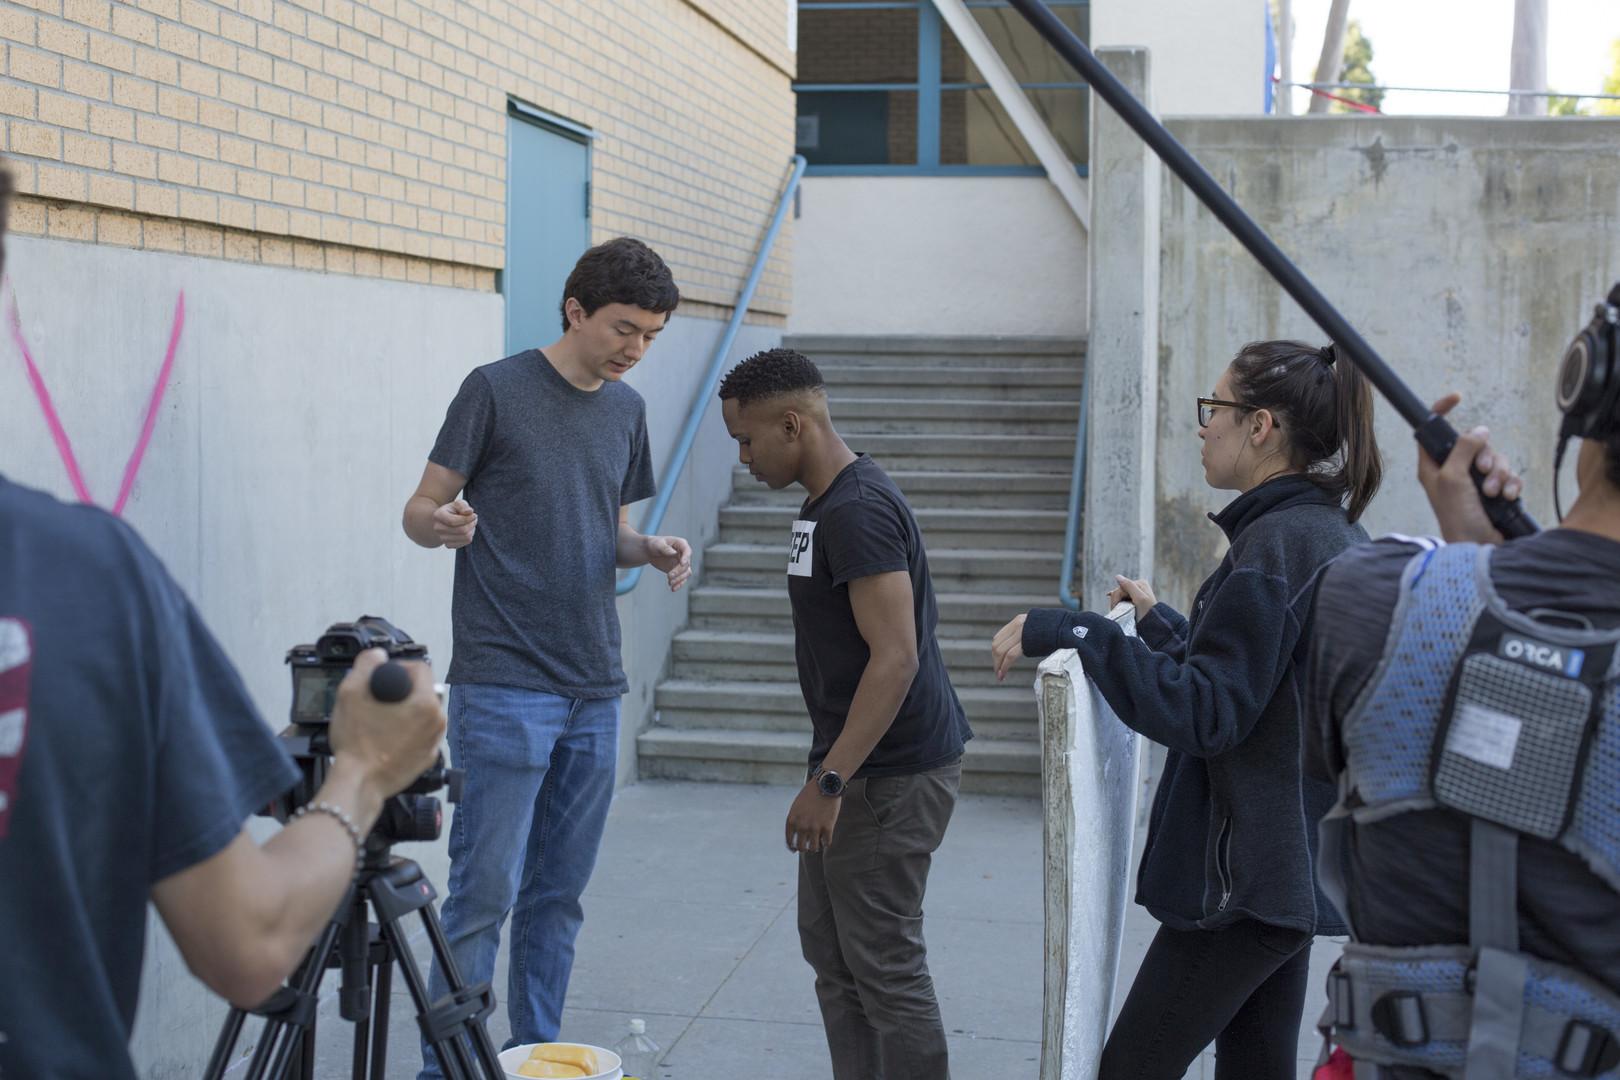 Ryan Larkin directs Reale Kgobokoe during the film's final scene - Photo: Keith Battista